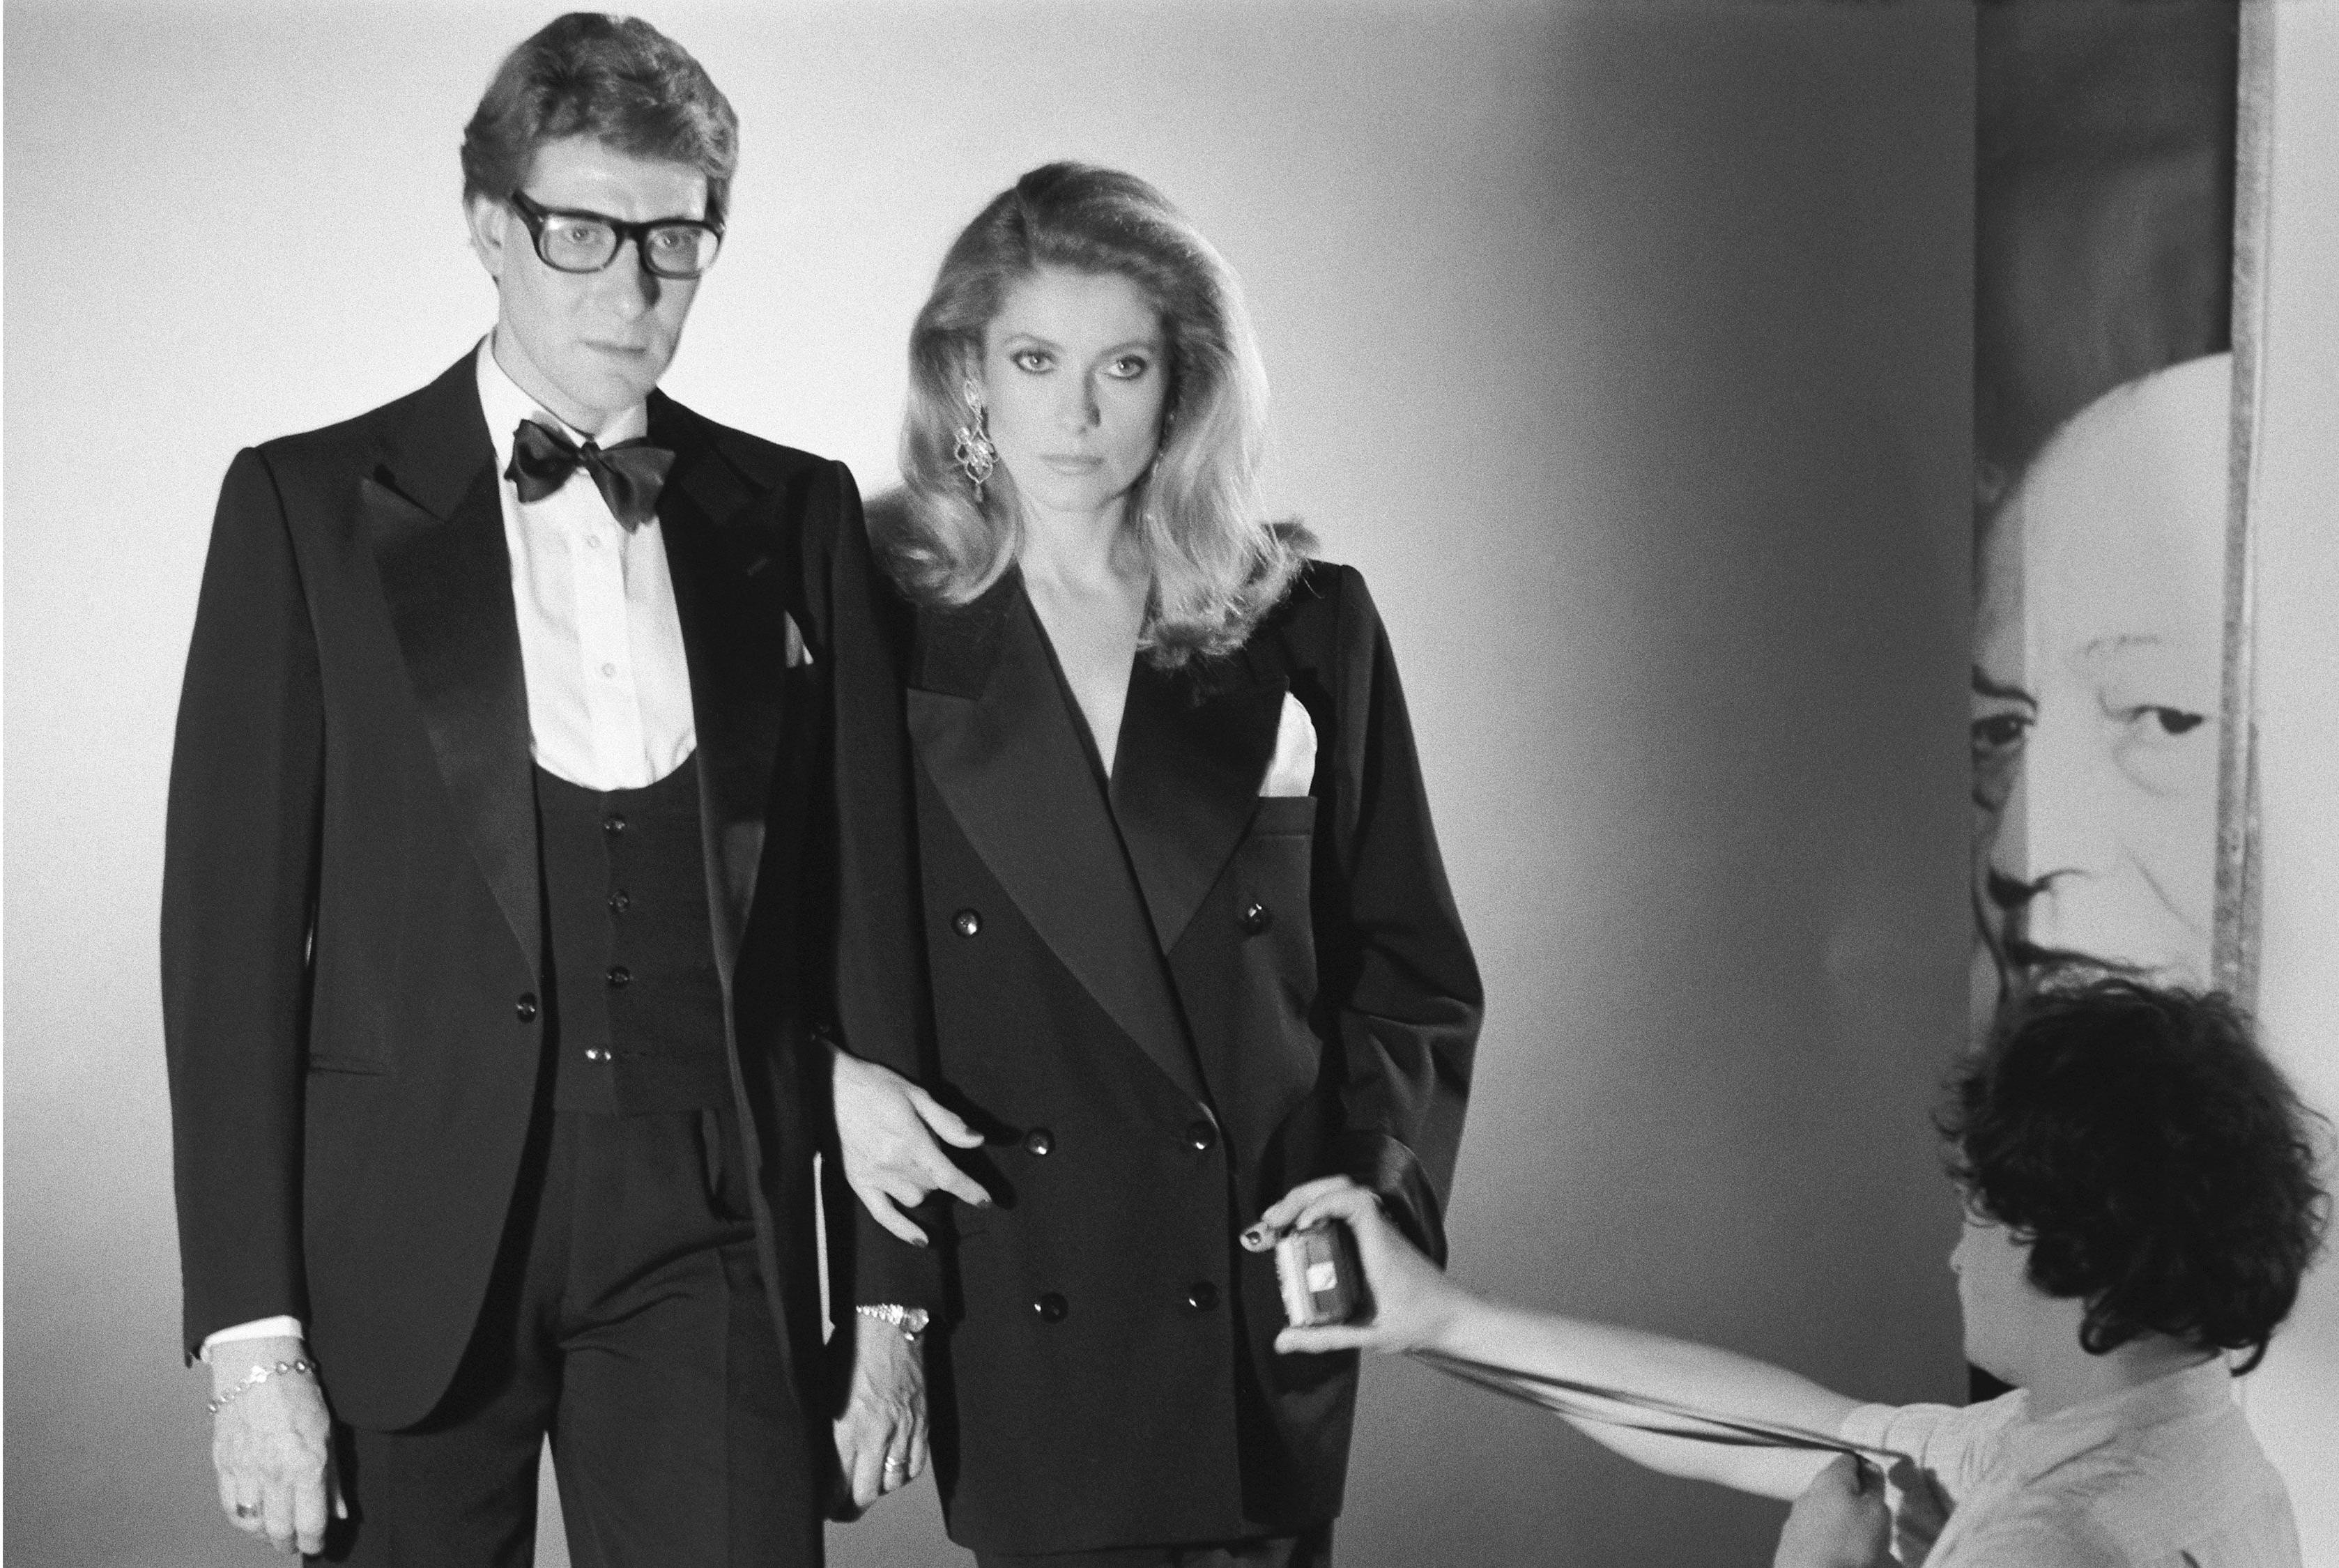 Portrait of Yves Saint Laurent and Catherine Deneuve